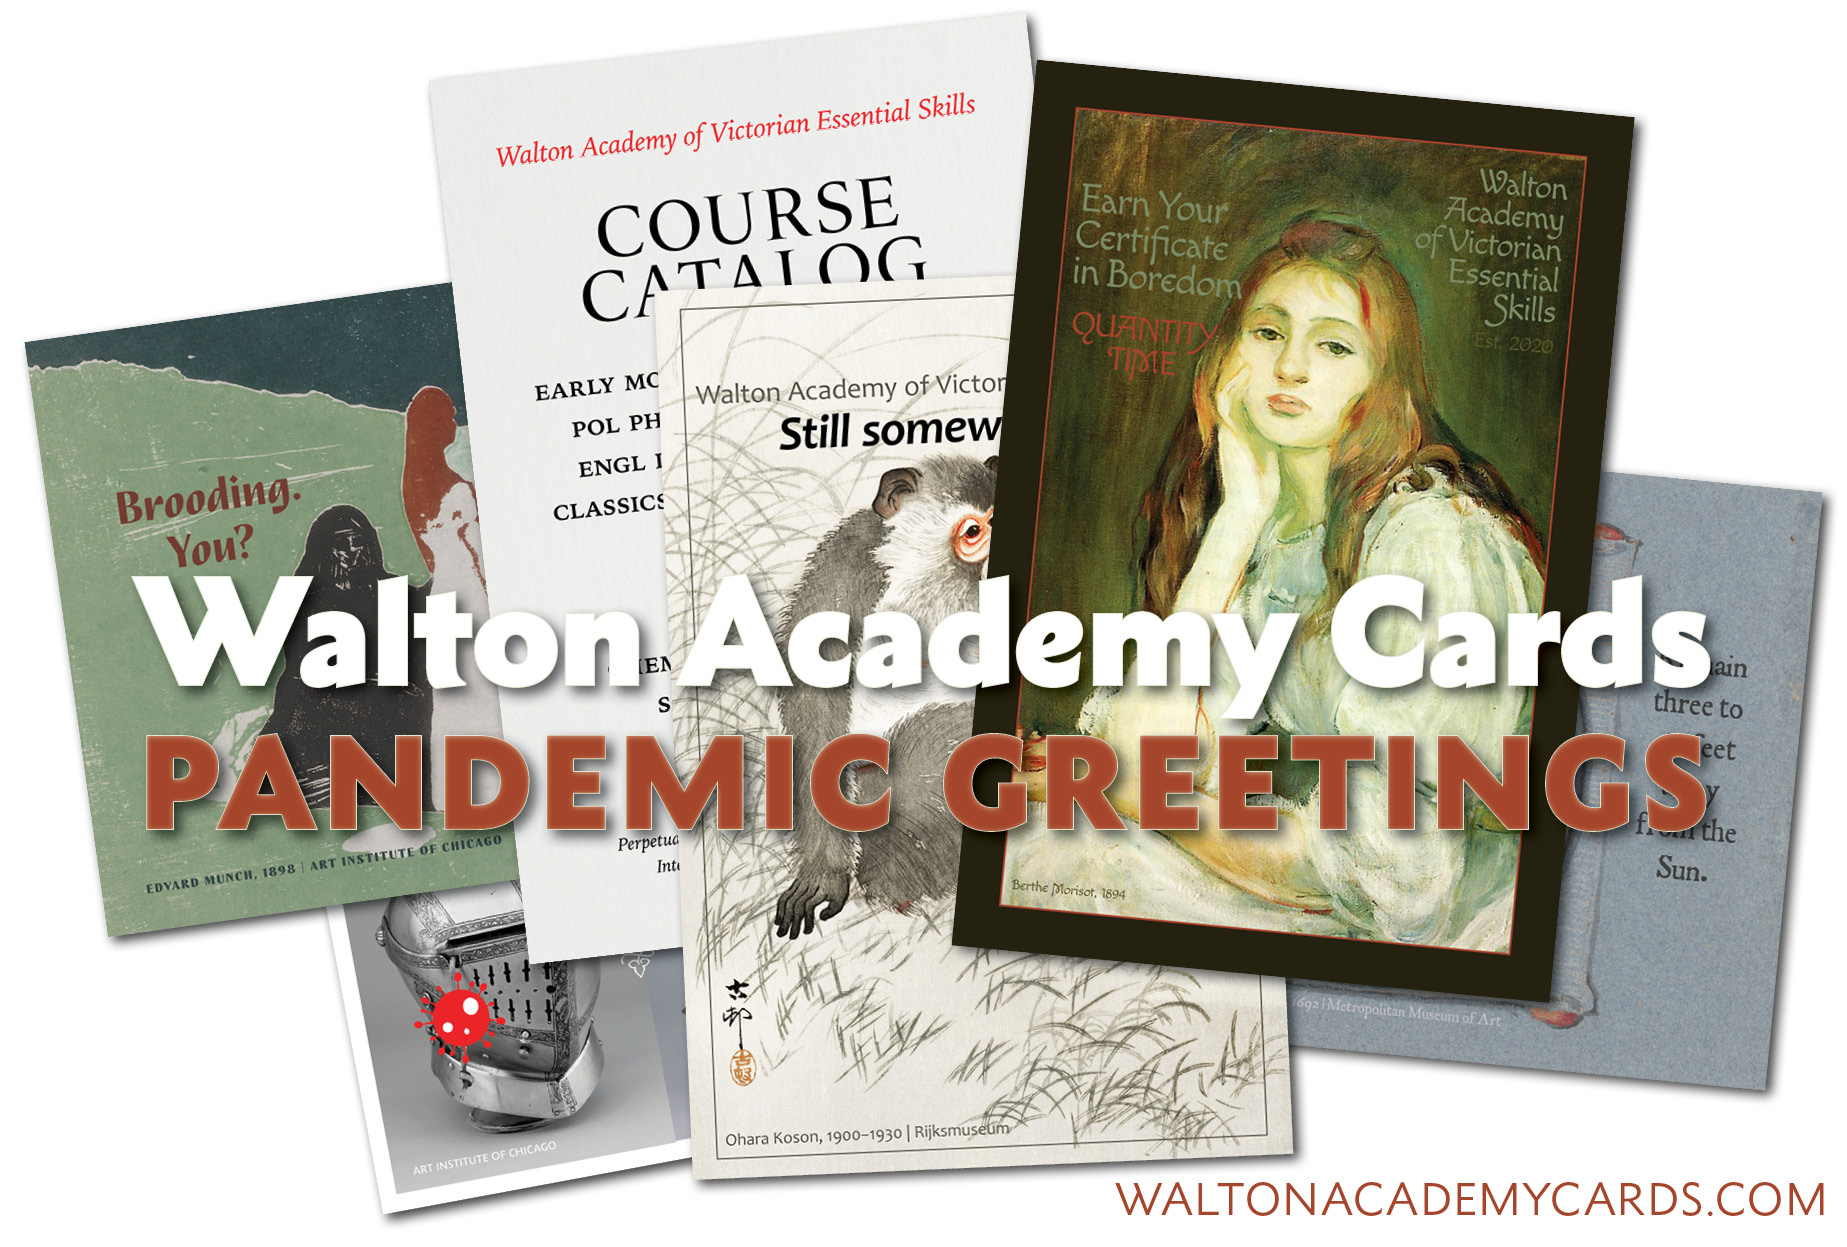 Visit Walton Academy Cards